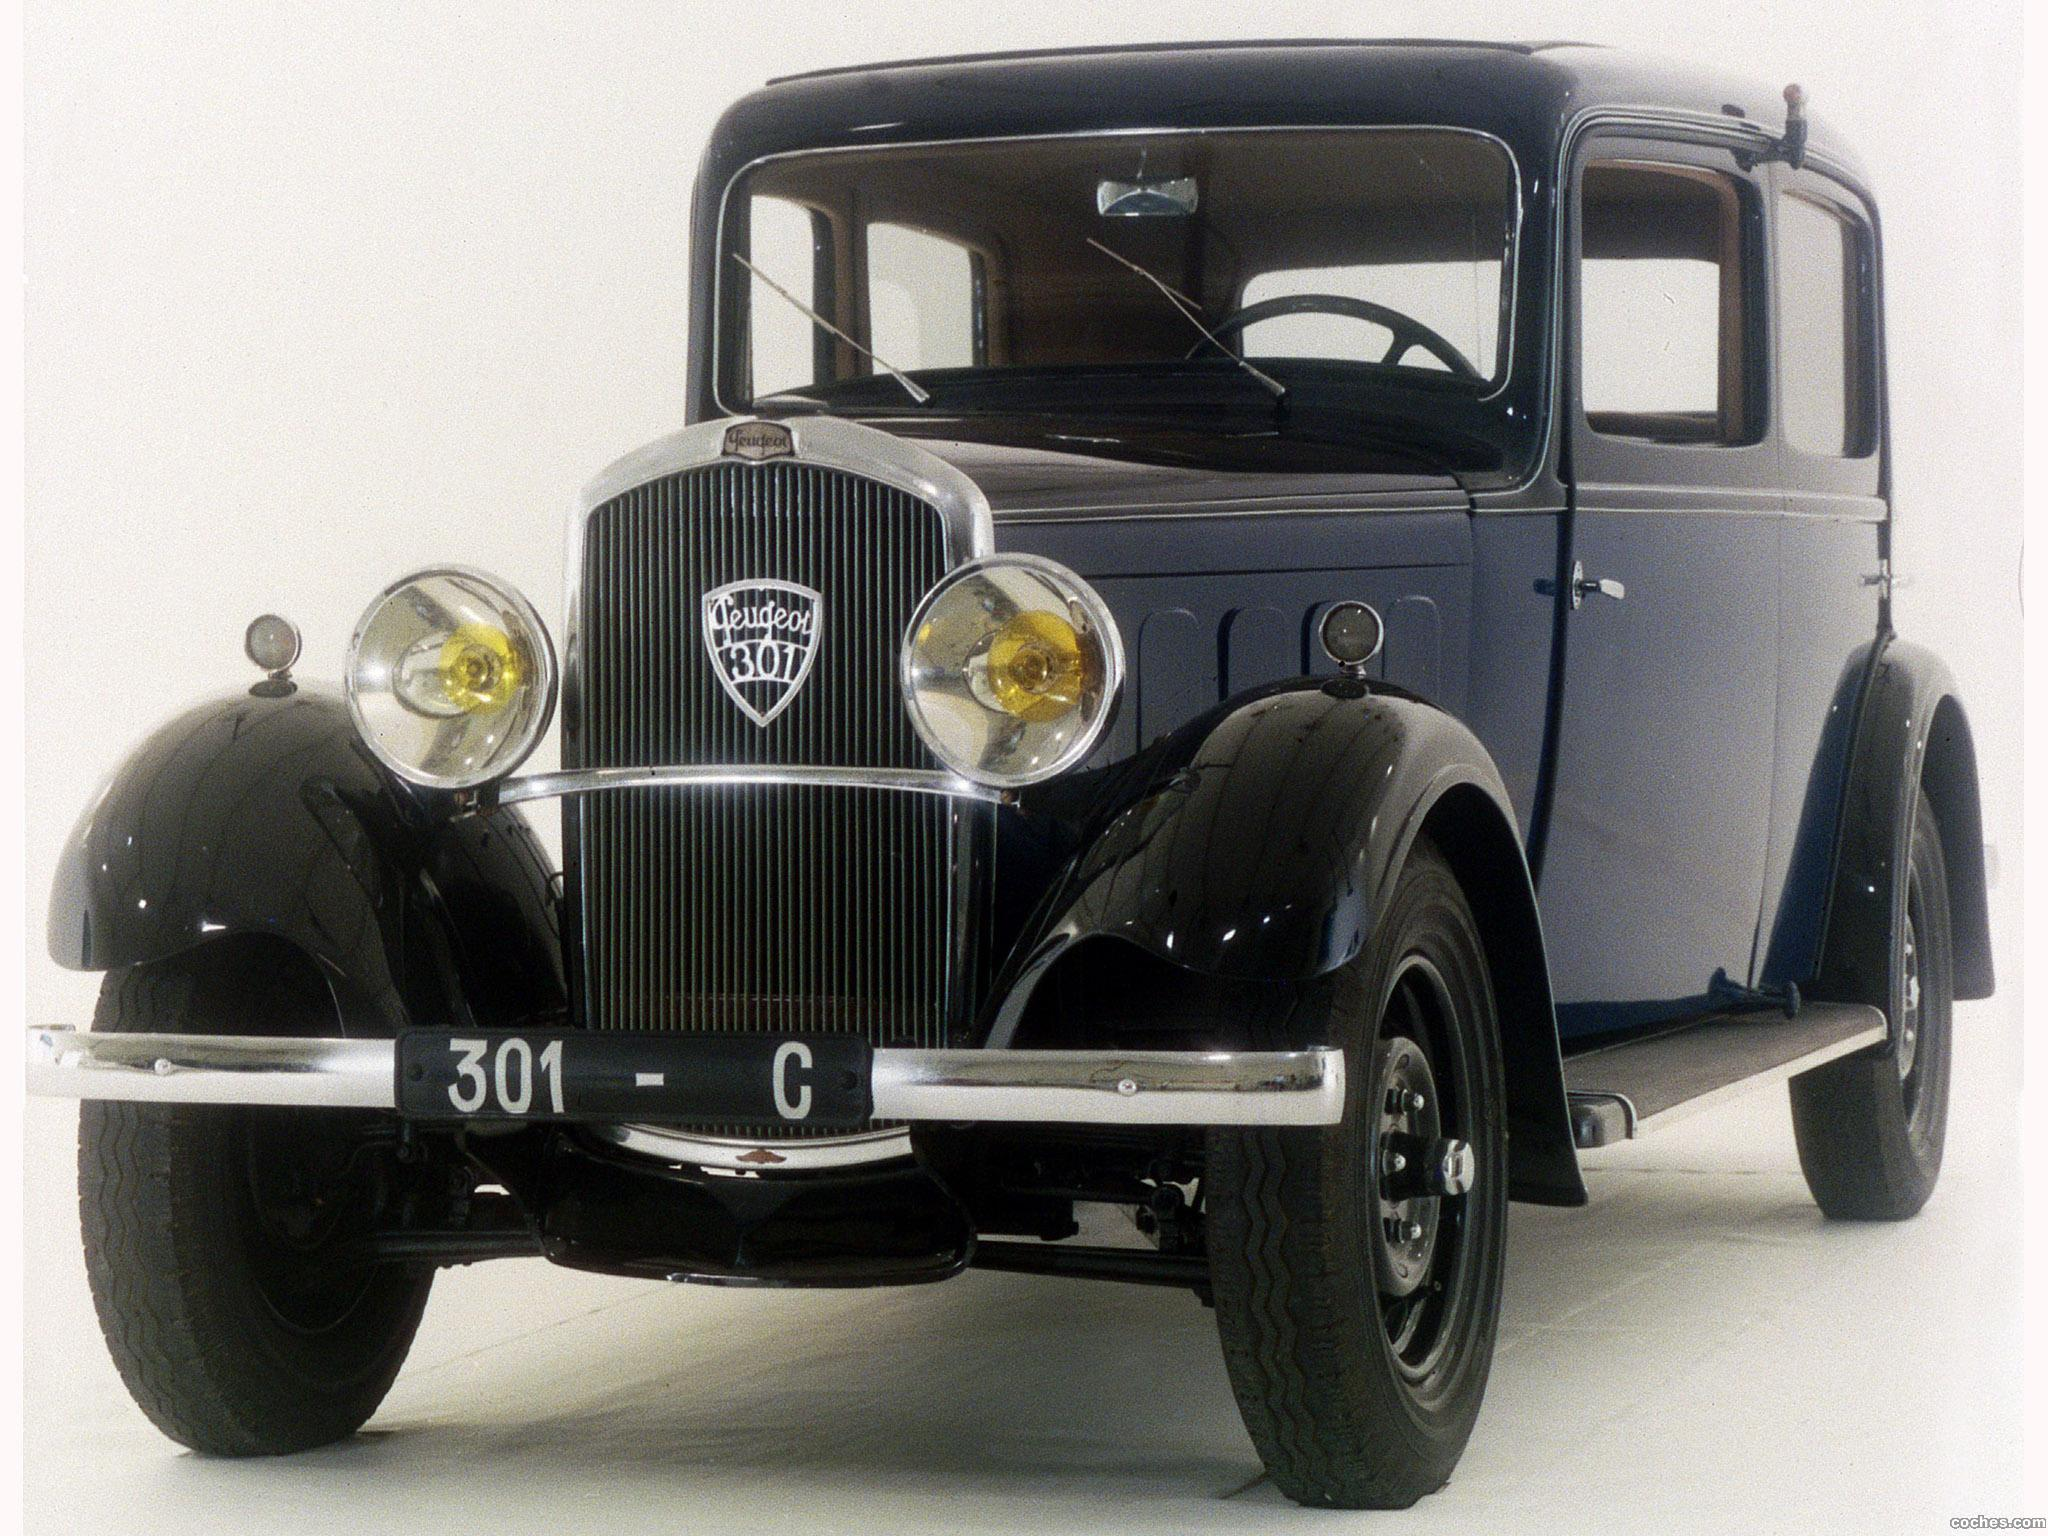 peugeot_301-1932-36_r4